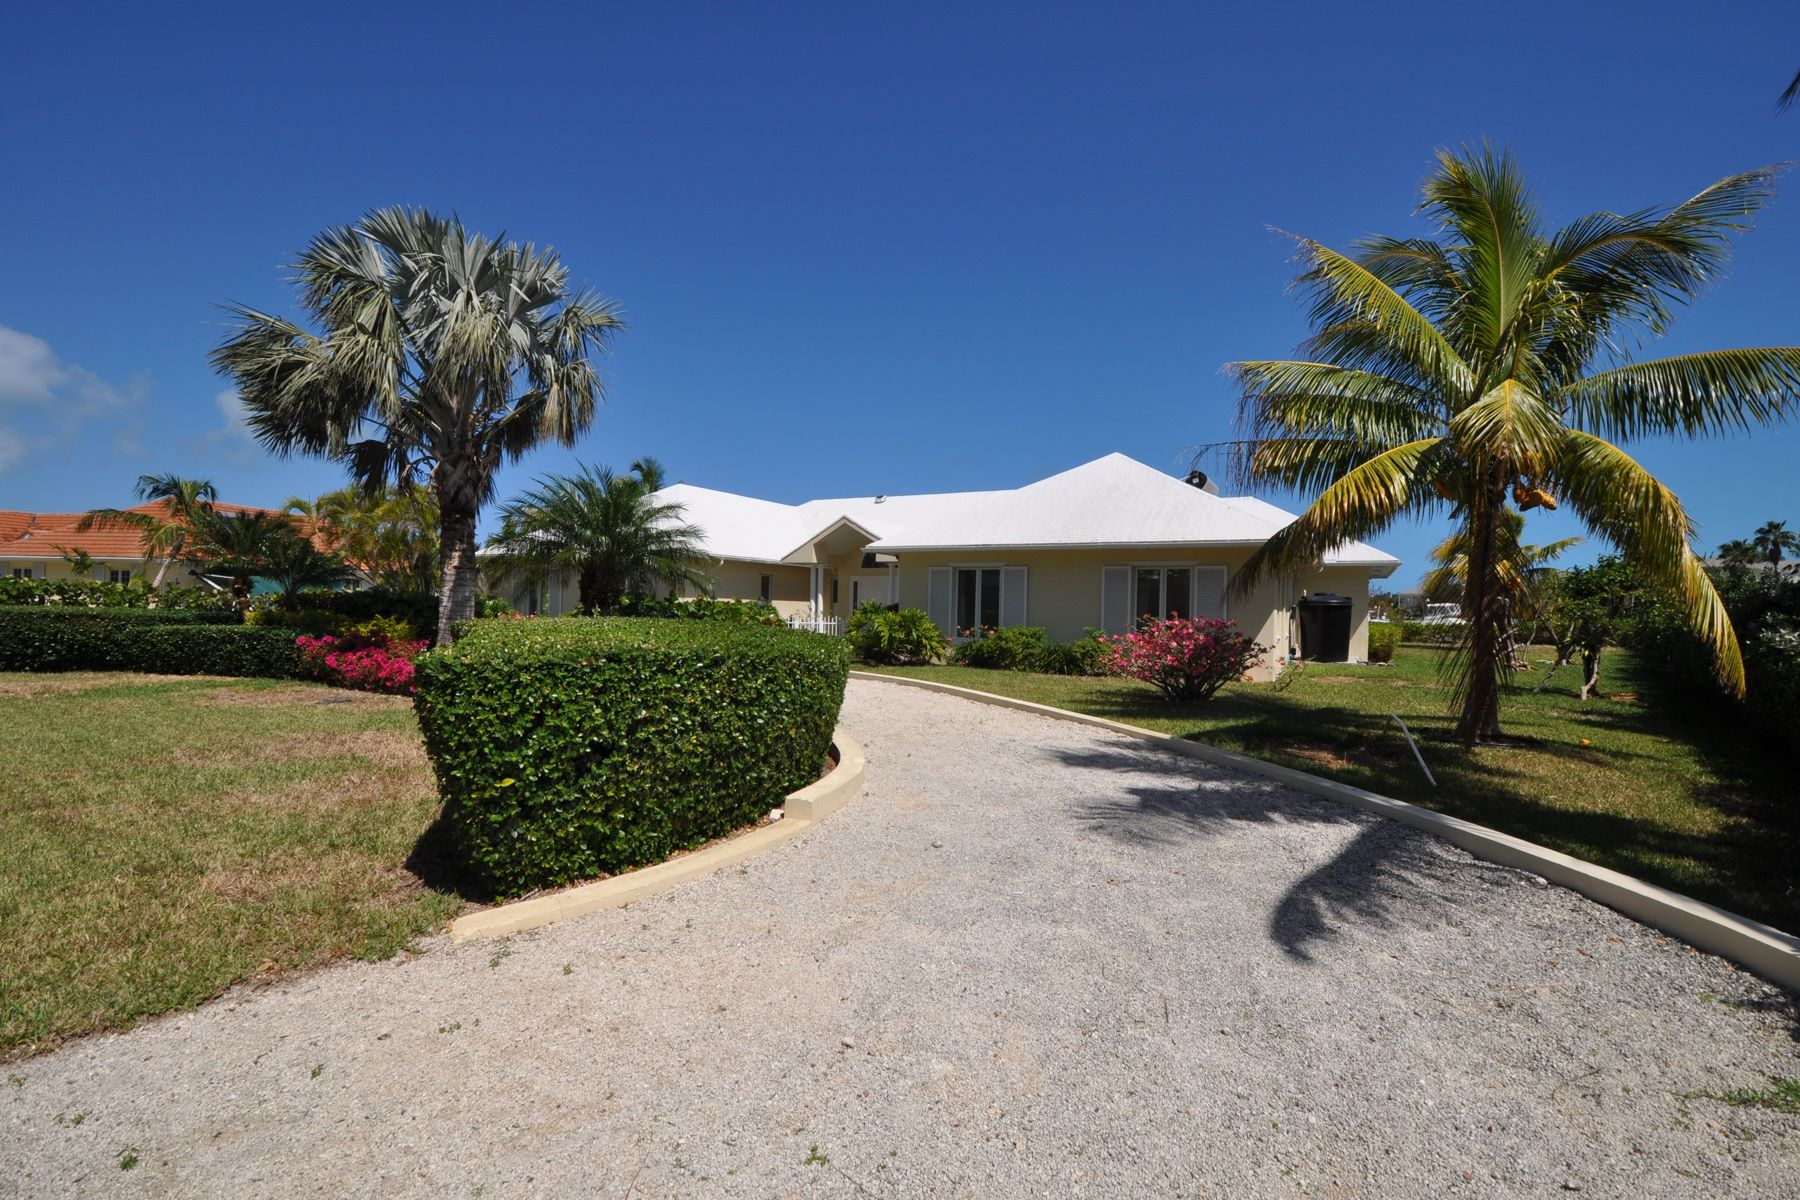 Einfamilienhaus für Verkauf beim #3 Island Drive, Port New Providence Port New Providence, Yamacraw, New Providence/Nassau Bahamas